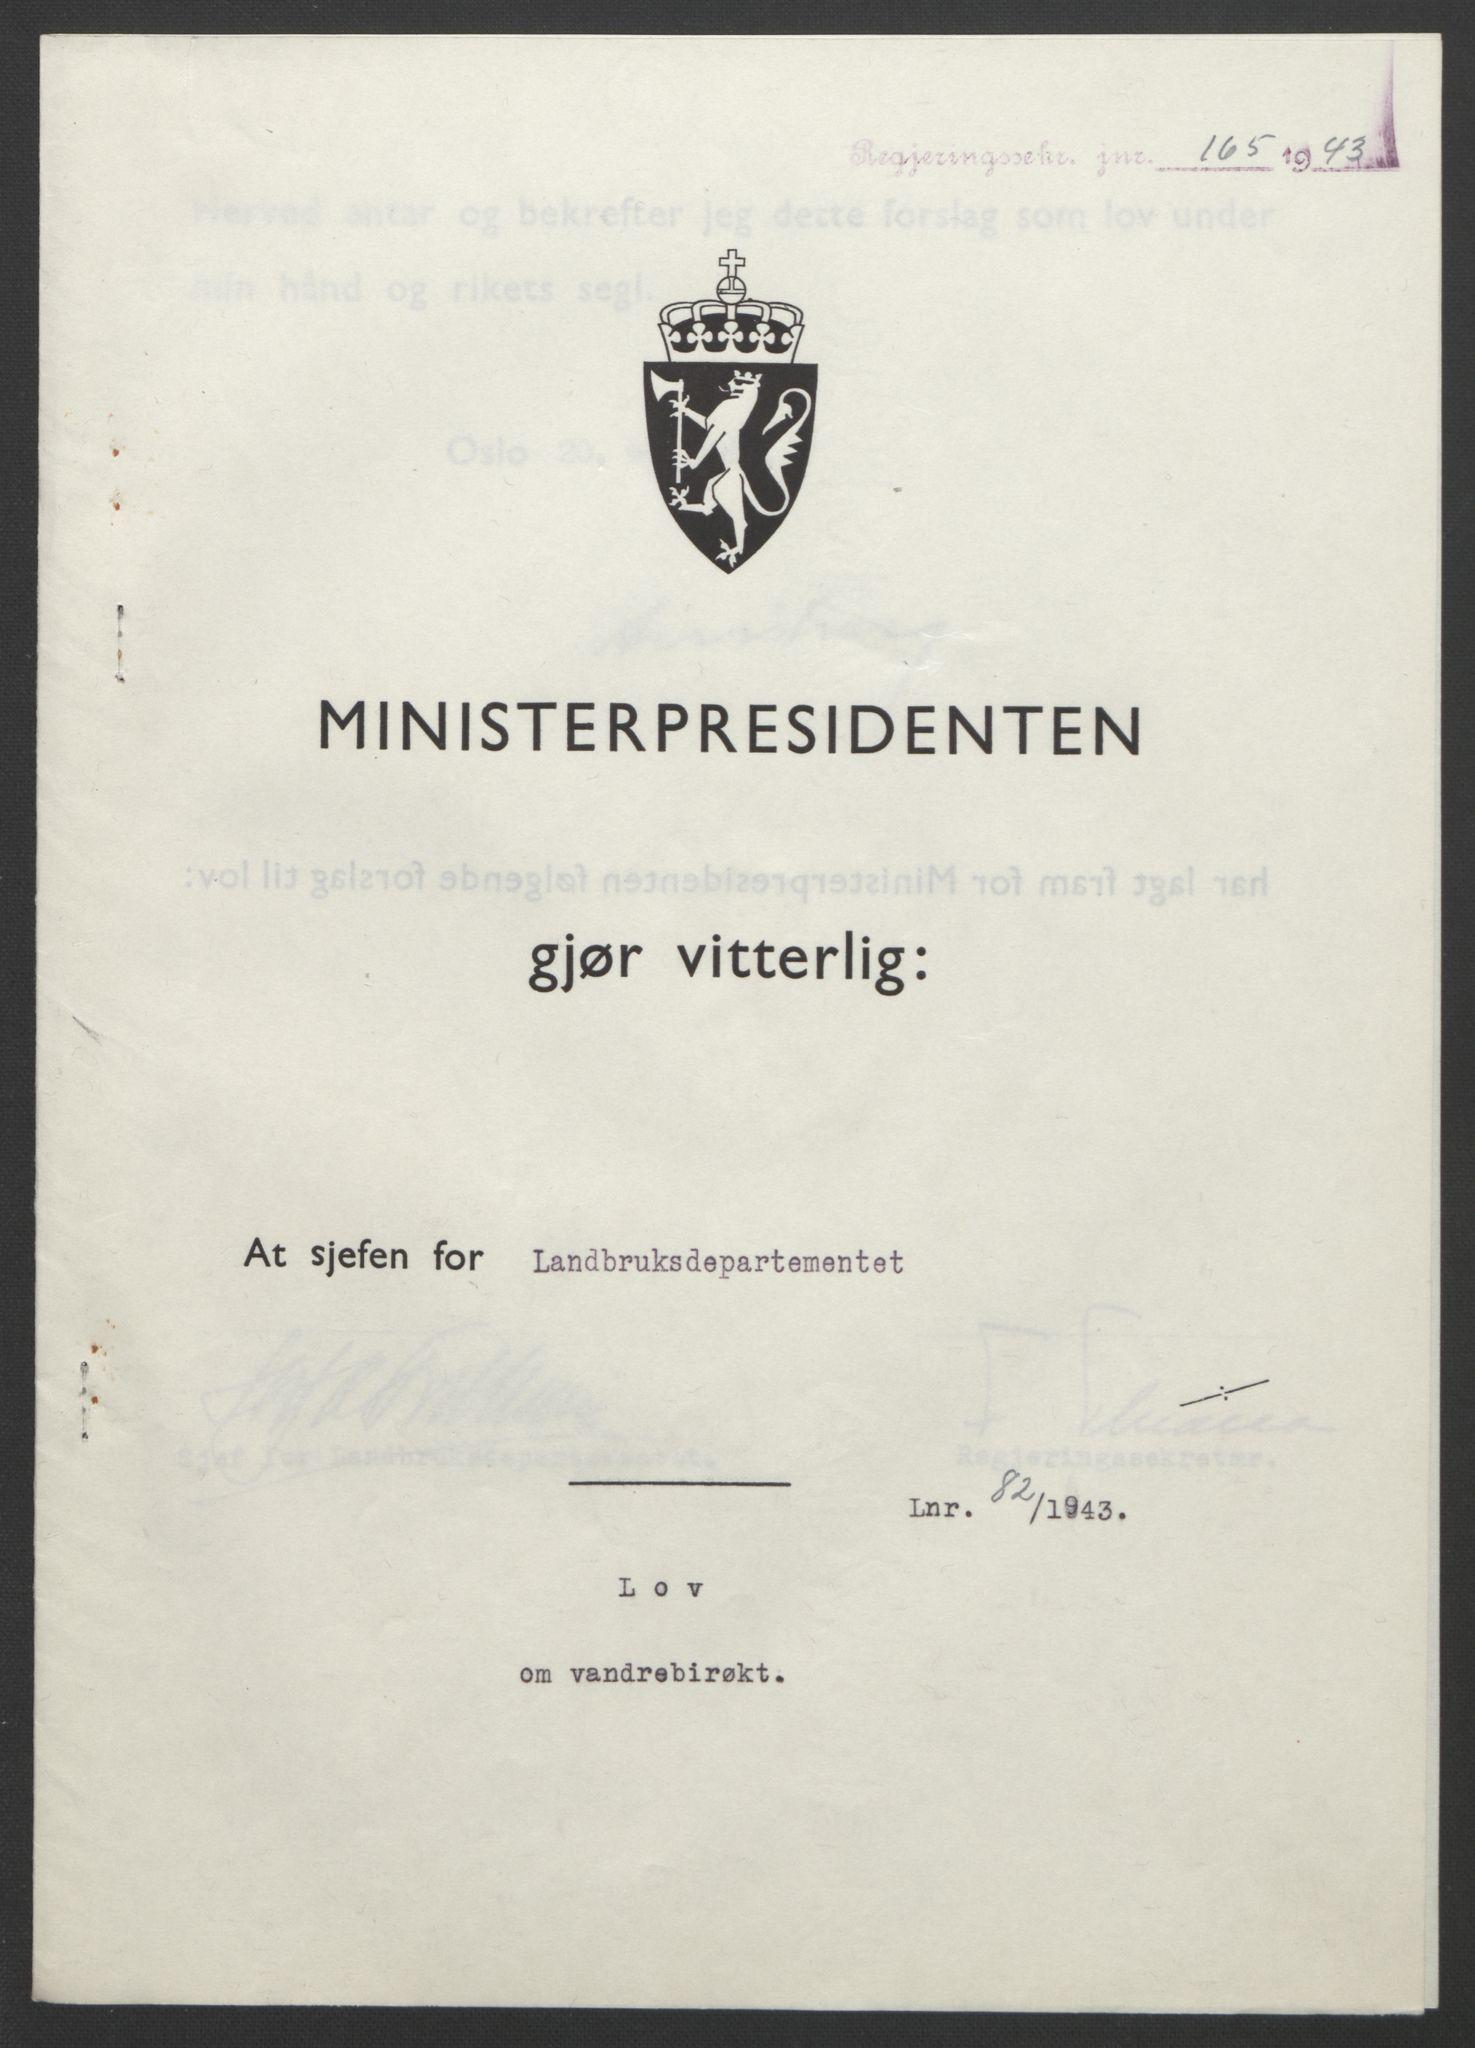 RA, NS-administrasjonen 1940-1945 (Statsrådsekretariatet, de kommisariske statsråder mm), D/Db/L0099: Lover, 1943, s. 374